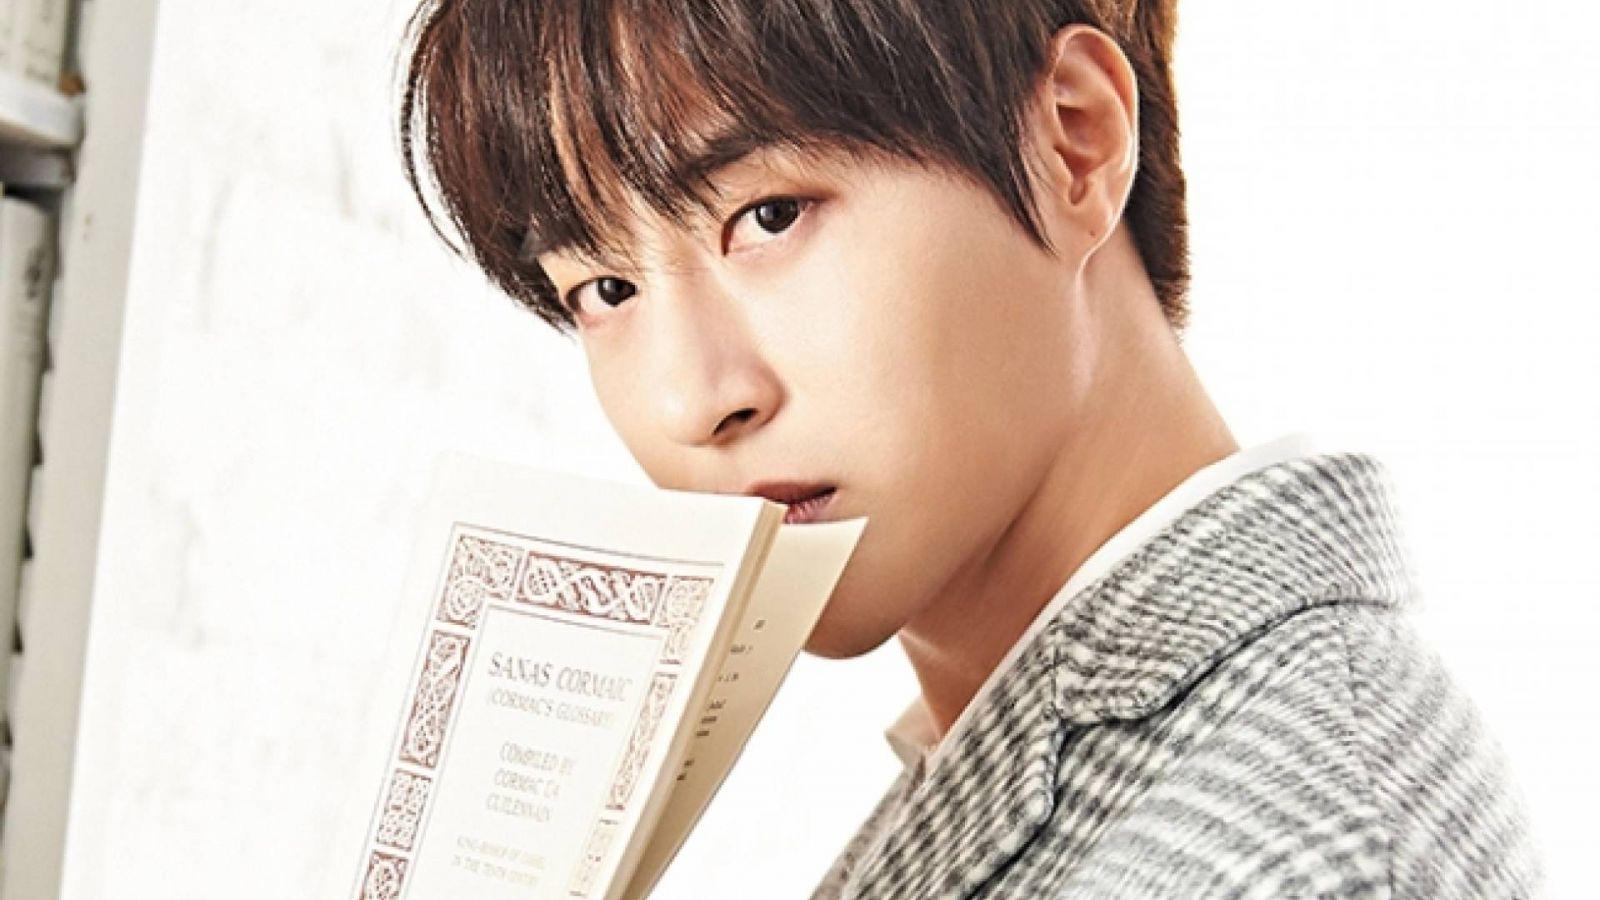 100%:n Seo Minwoo on kuollut © KISS Entertainment Inc.